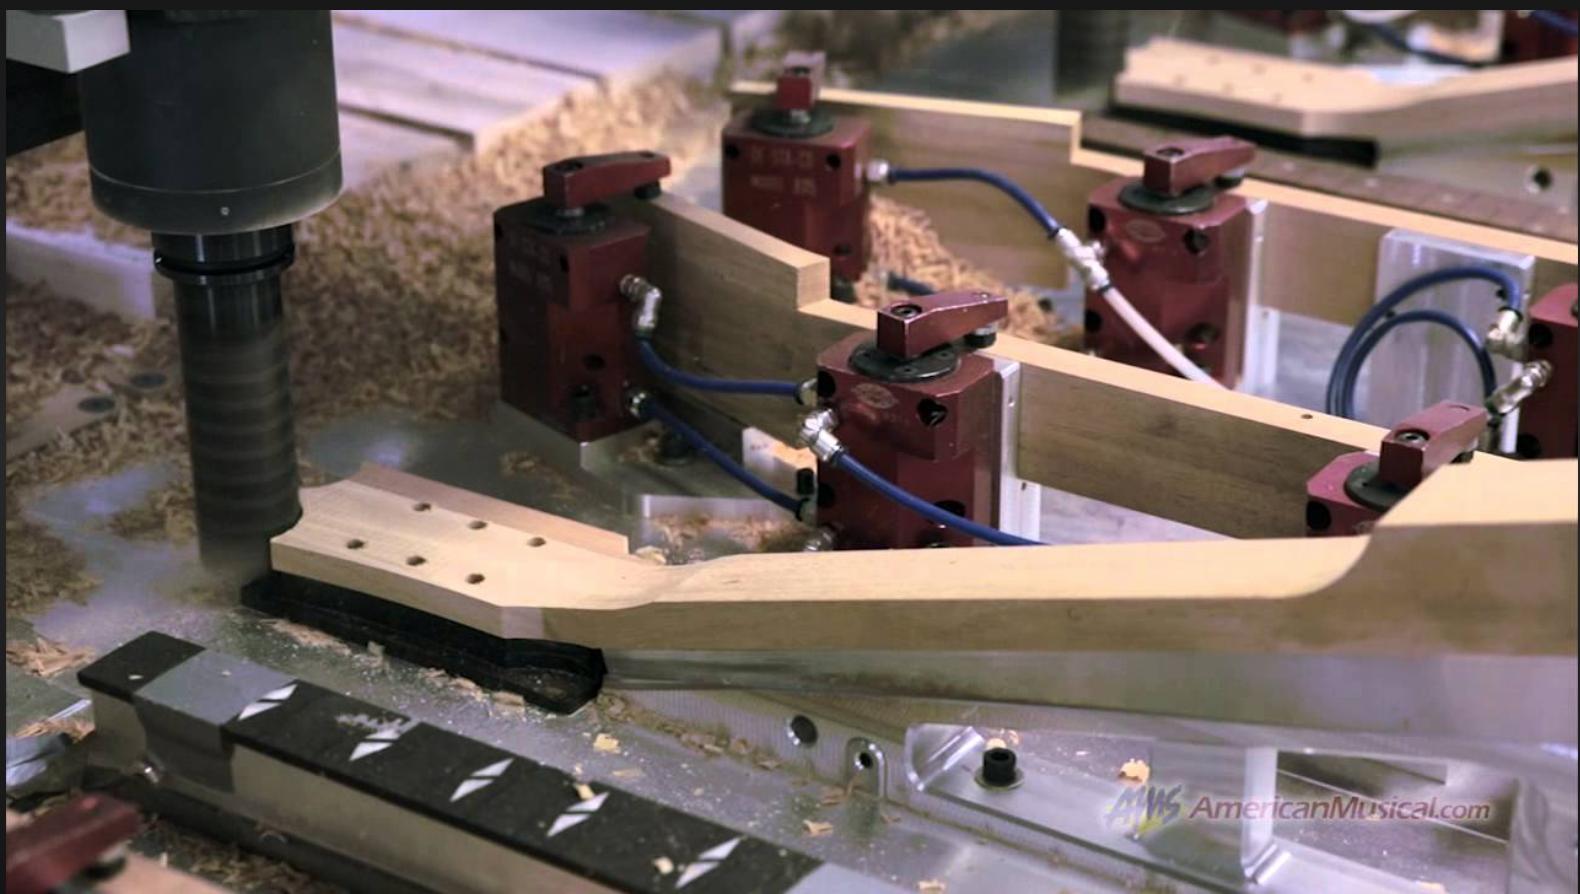 Respraying finish cracks in beater guitar-screen-shot-2021-04-03-11-49-35-am-png